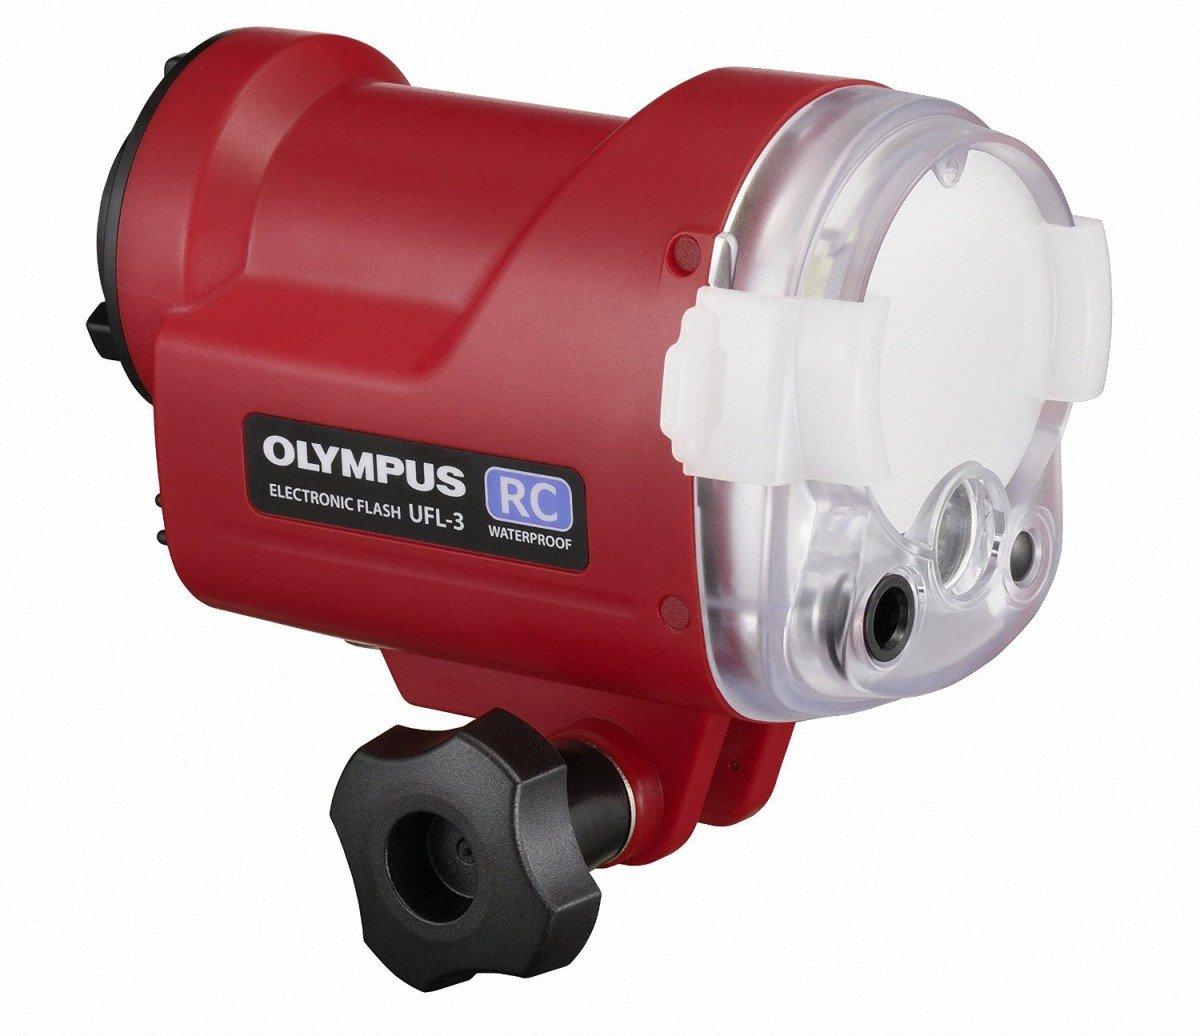 OLYMPUS 水中専用フラッシュ ガイドナンバー22 高速チャージ UFL-3   B00MVOVF9I